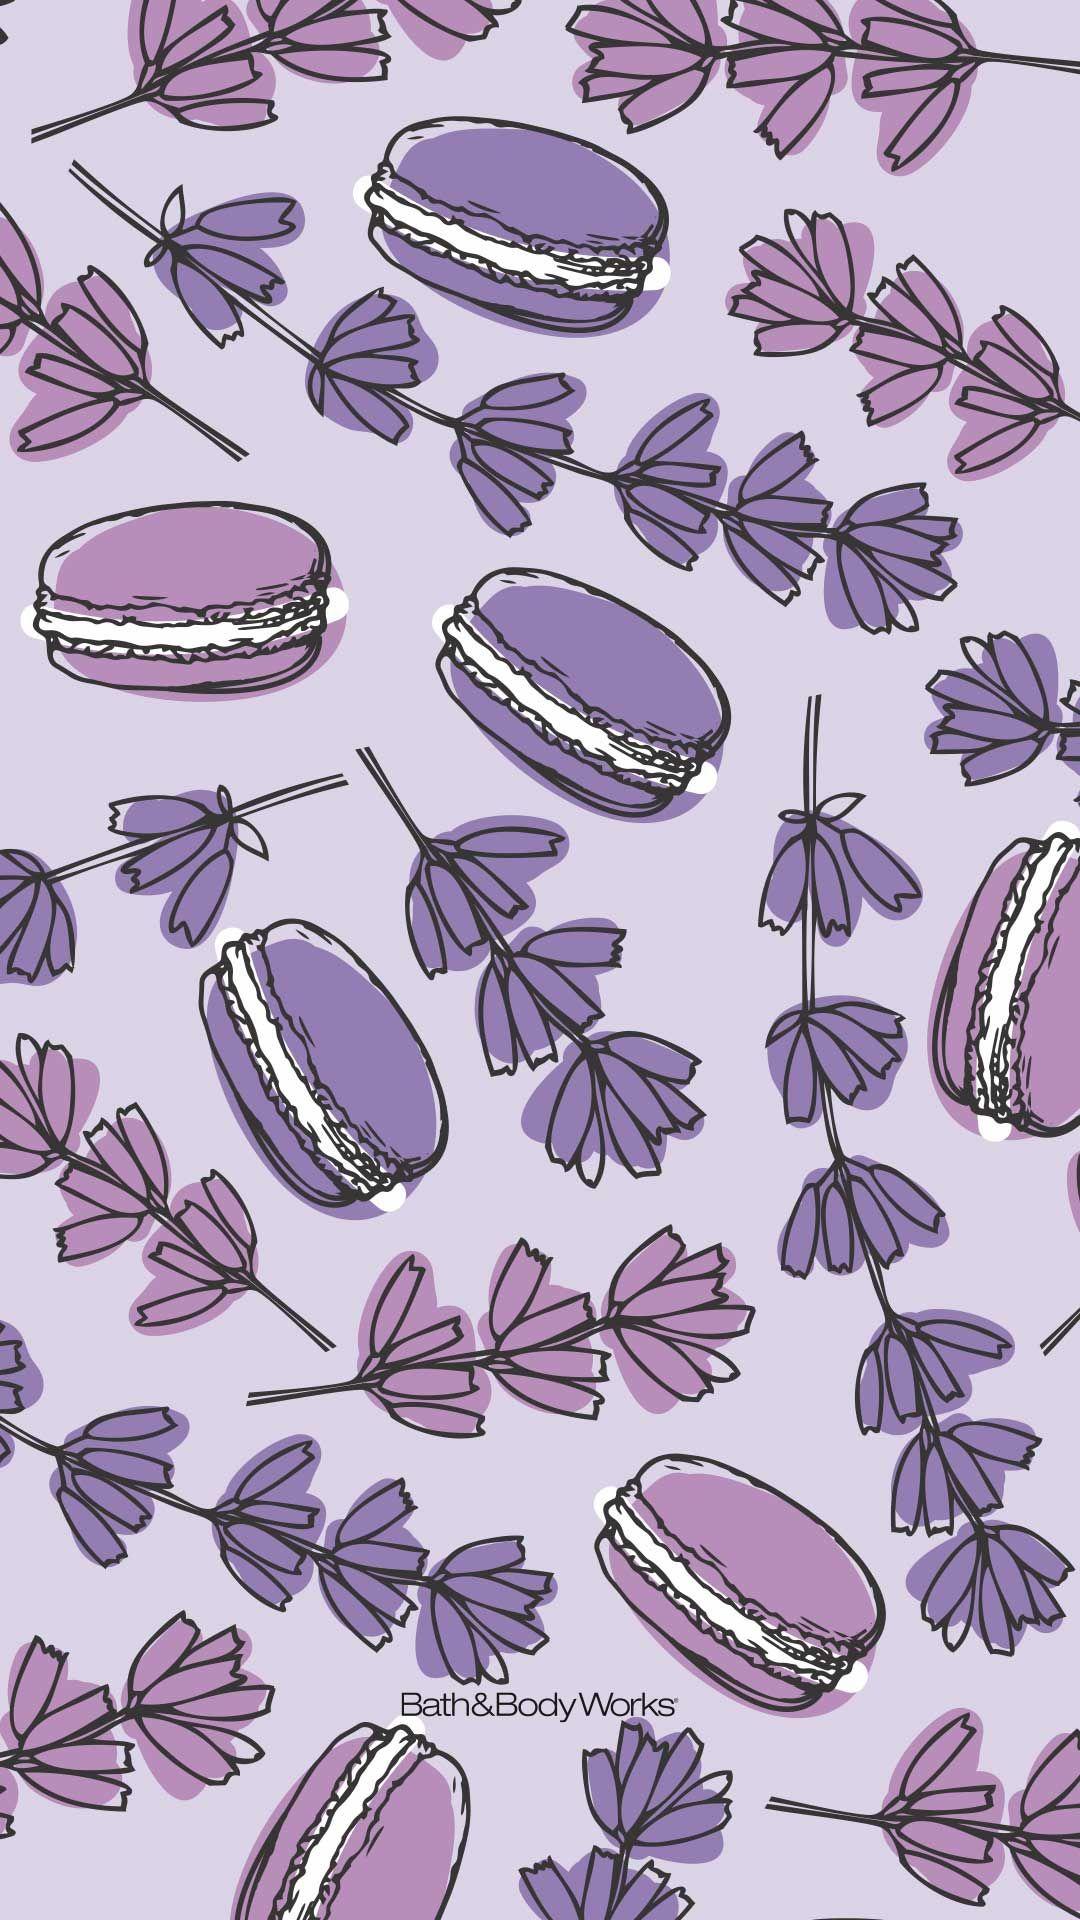 Valentine S Day Wallpaper In 2020 Purple Wallpaper Iphone Cute Wallpapers Iphone Background Wallpaper